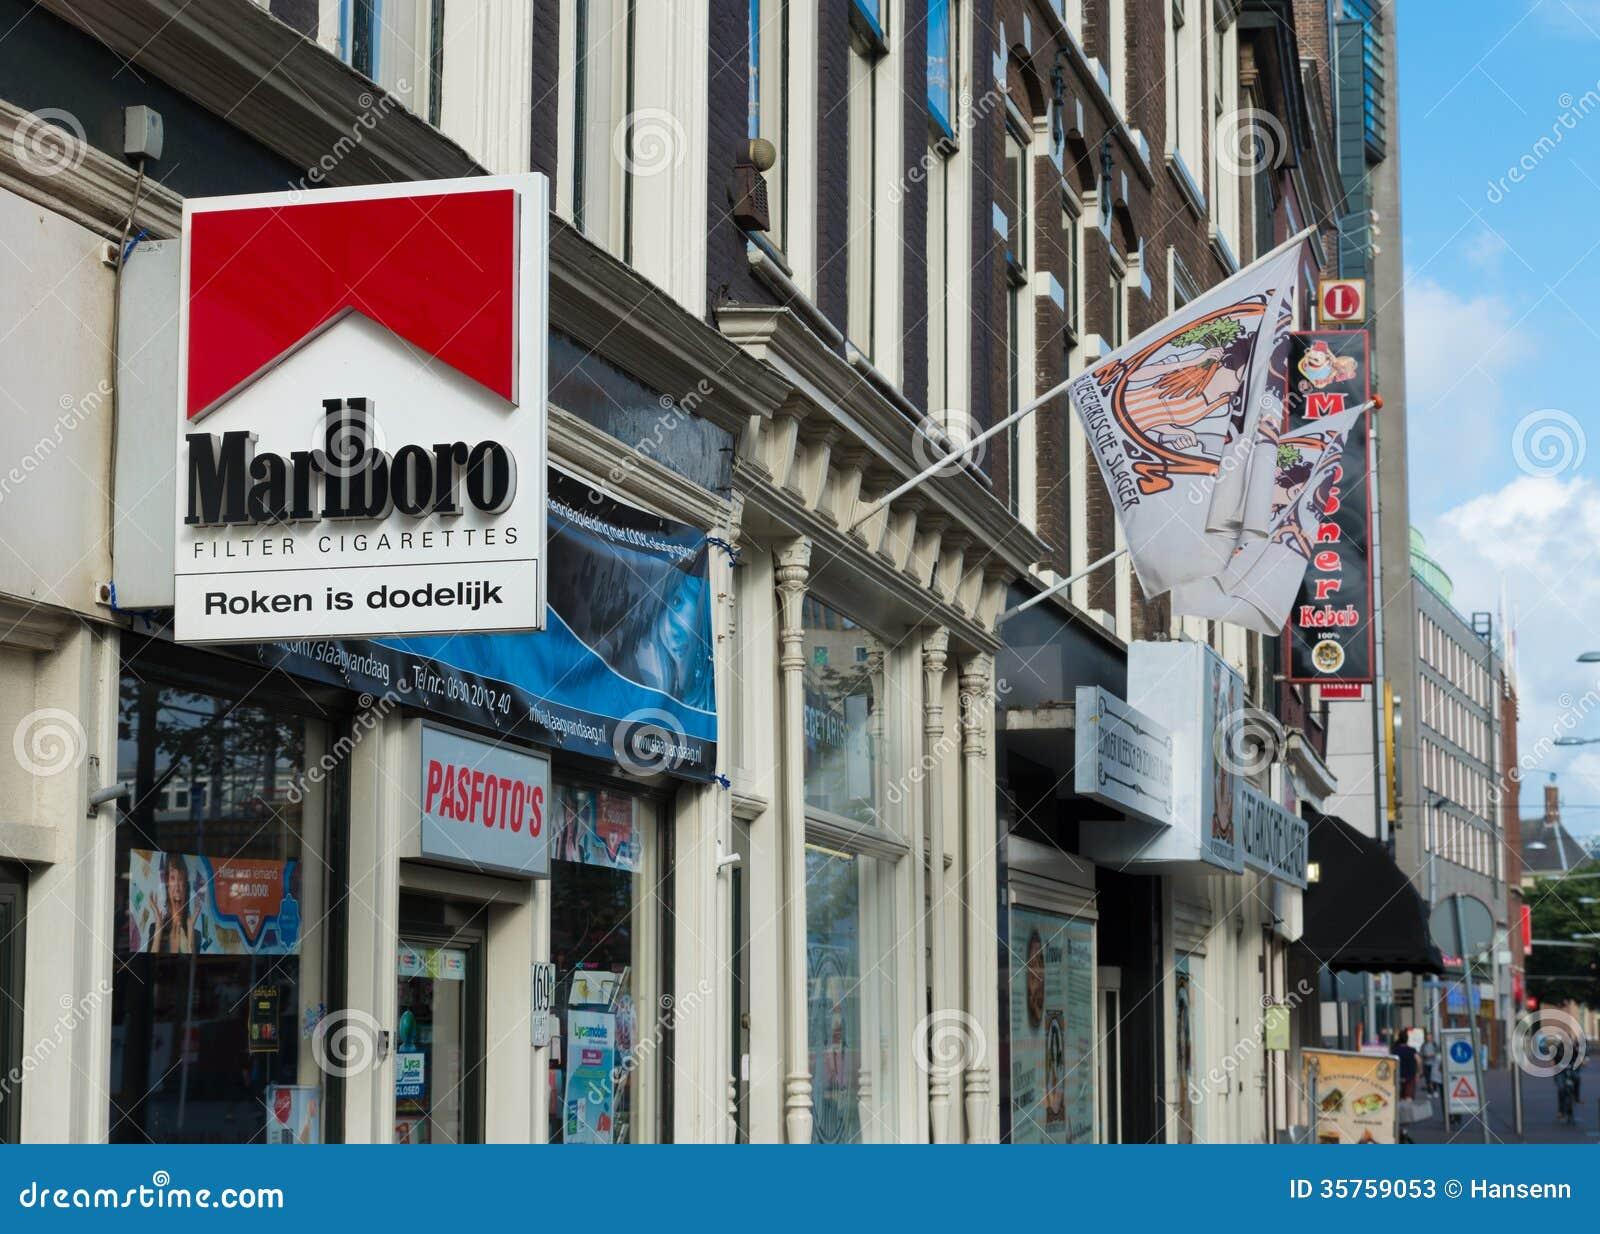 Buy cigarettes Parliament at Tesco